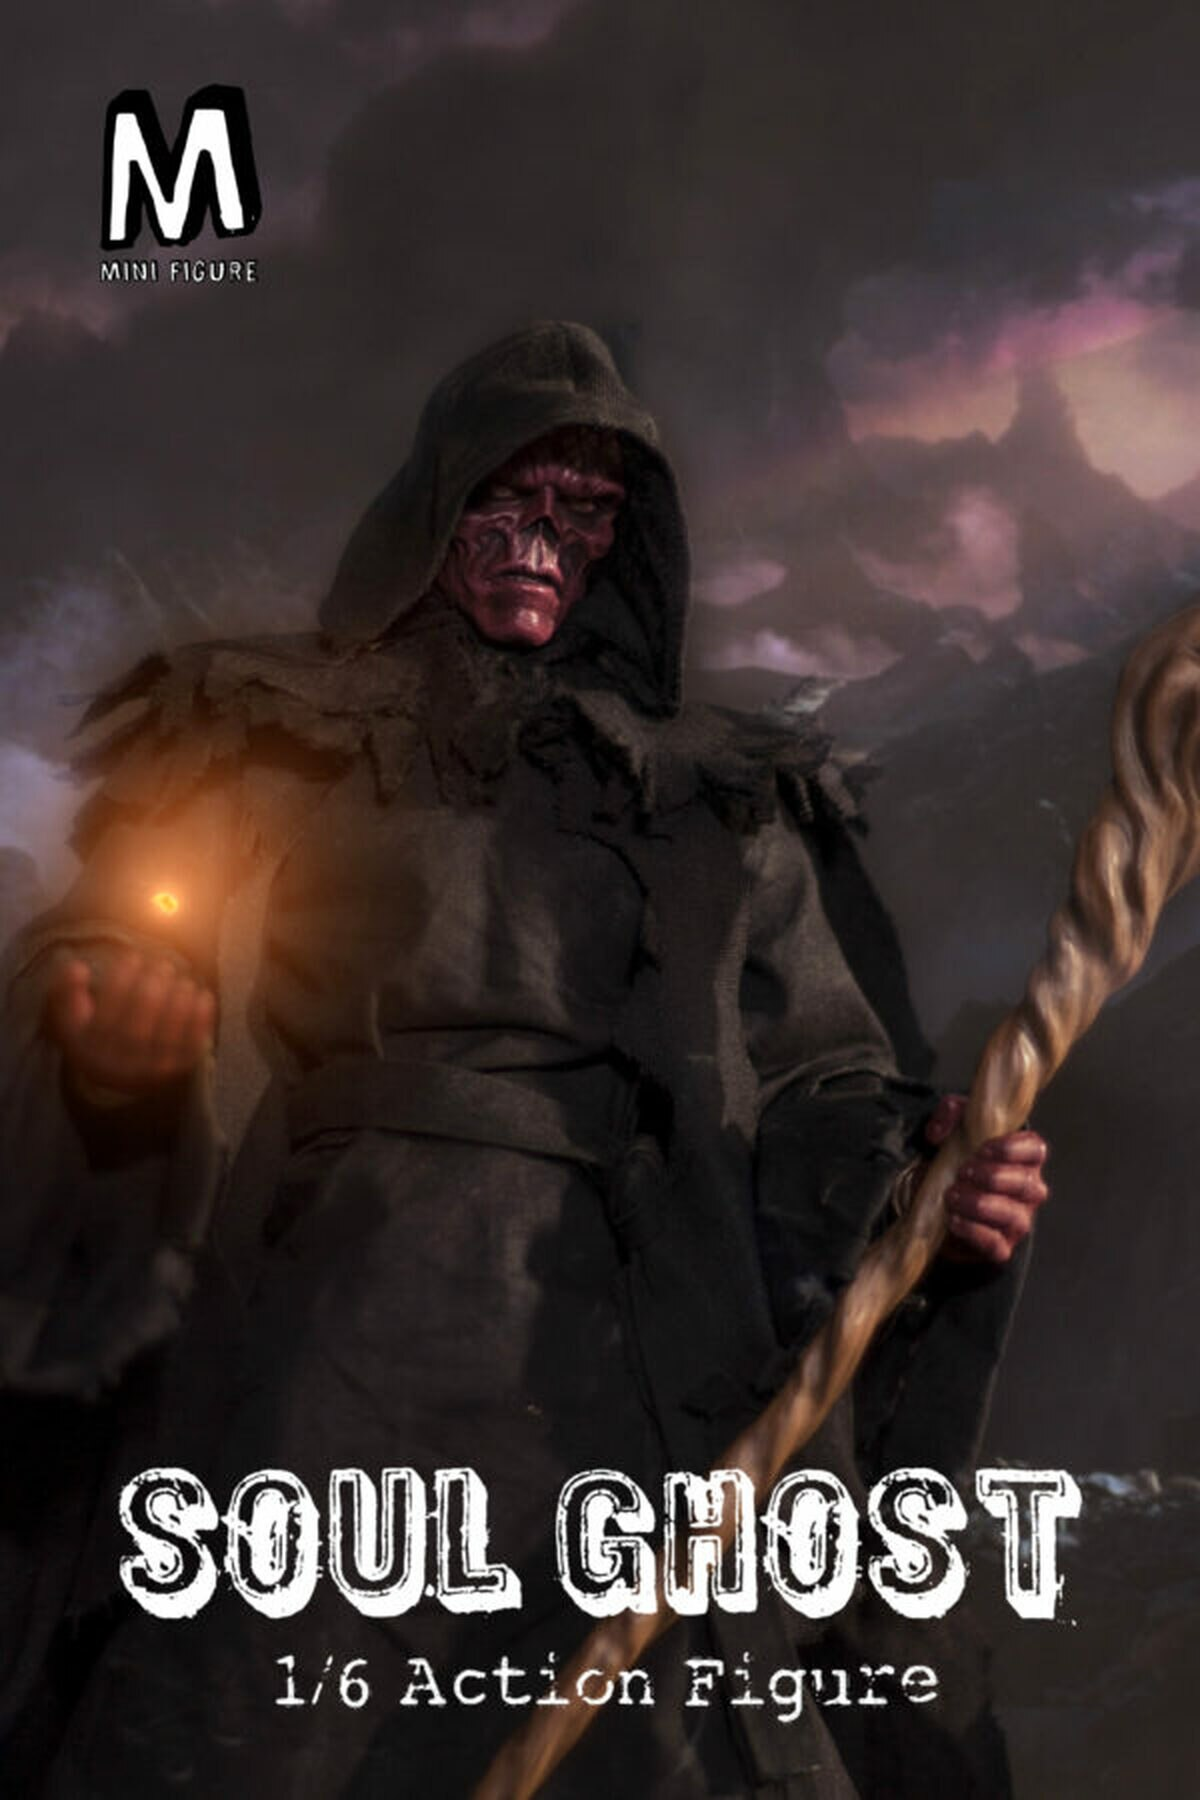 Action Figure Caveira Vermelha Soul Ghost: Os Vingadores Ultimato Avengers Endgame Escala 1/6 - Mini Figure